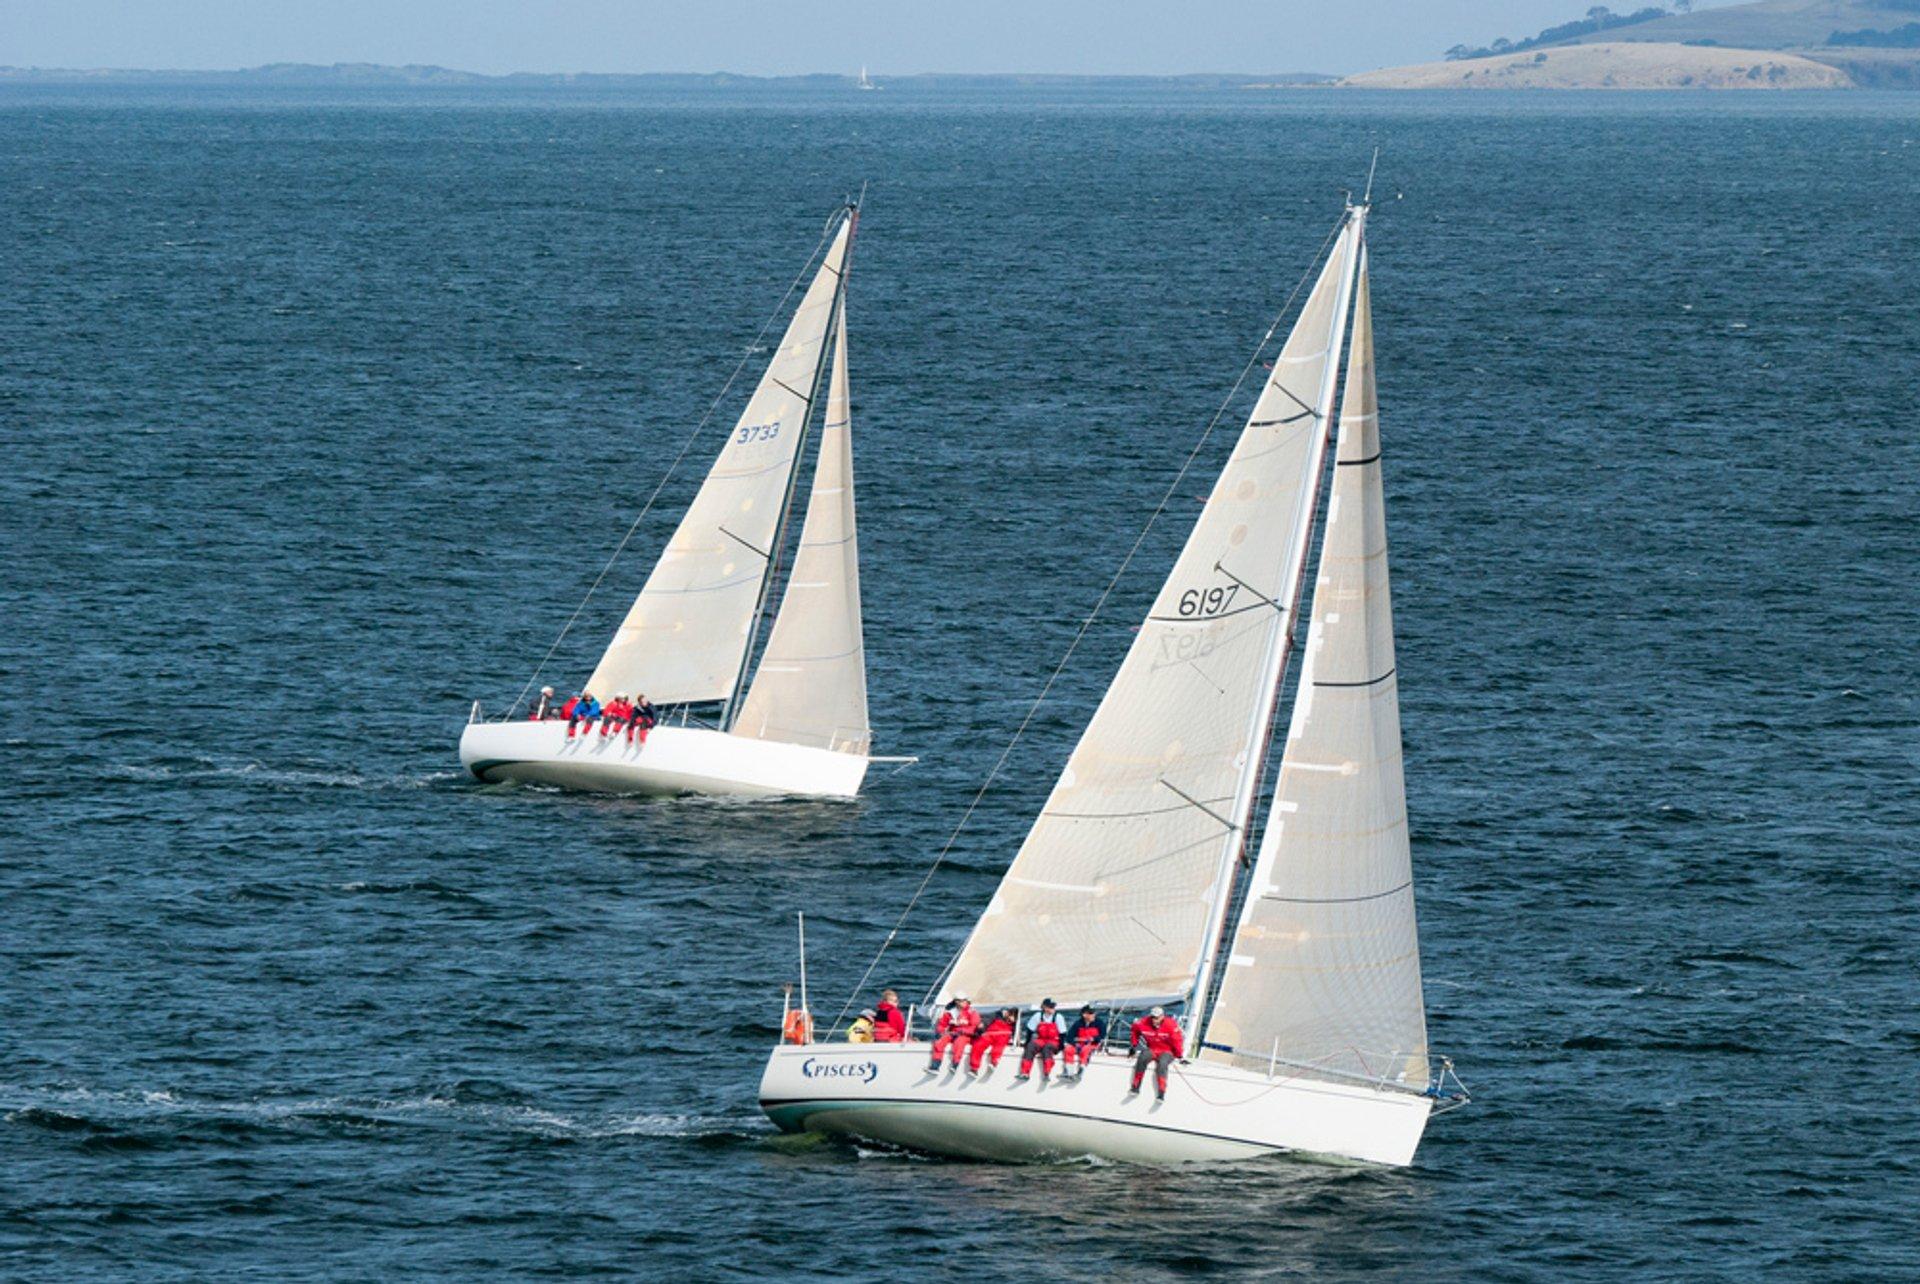 Yachting Season in Tasmania - Best Season